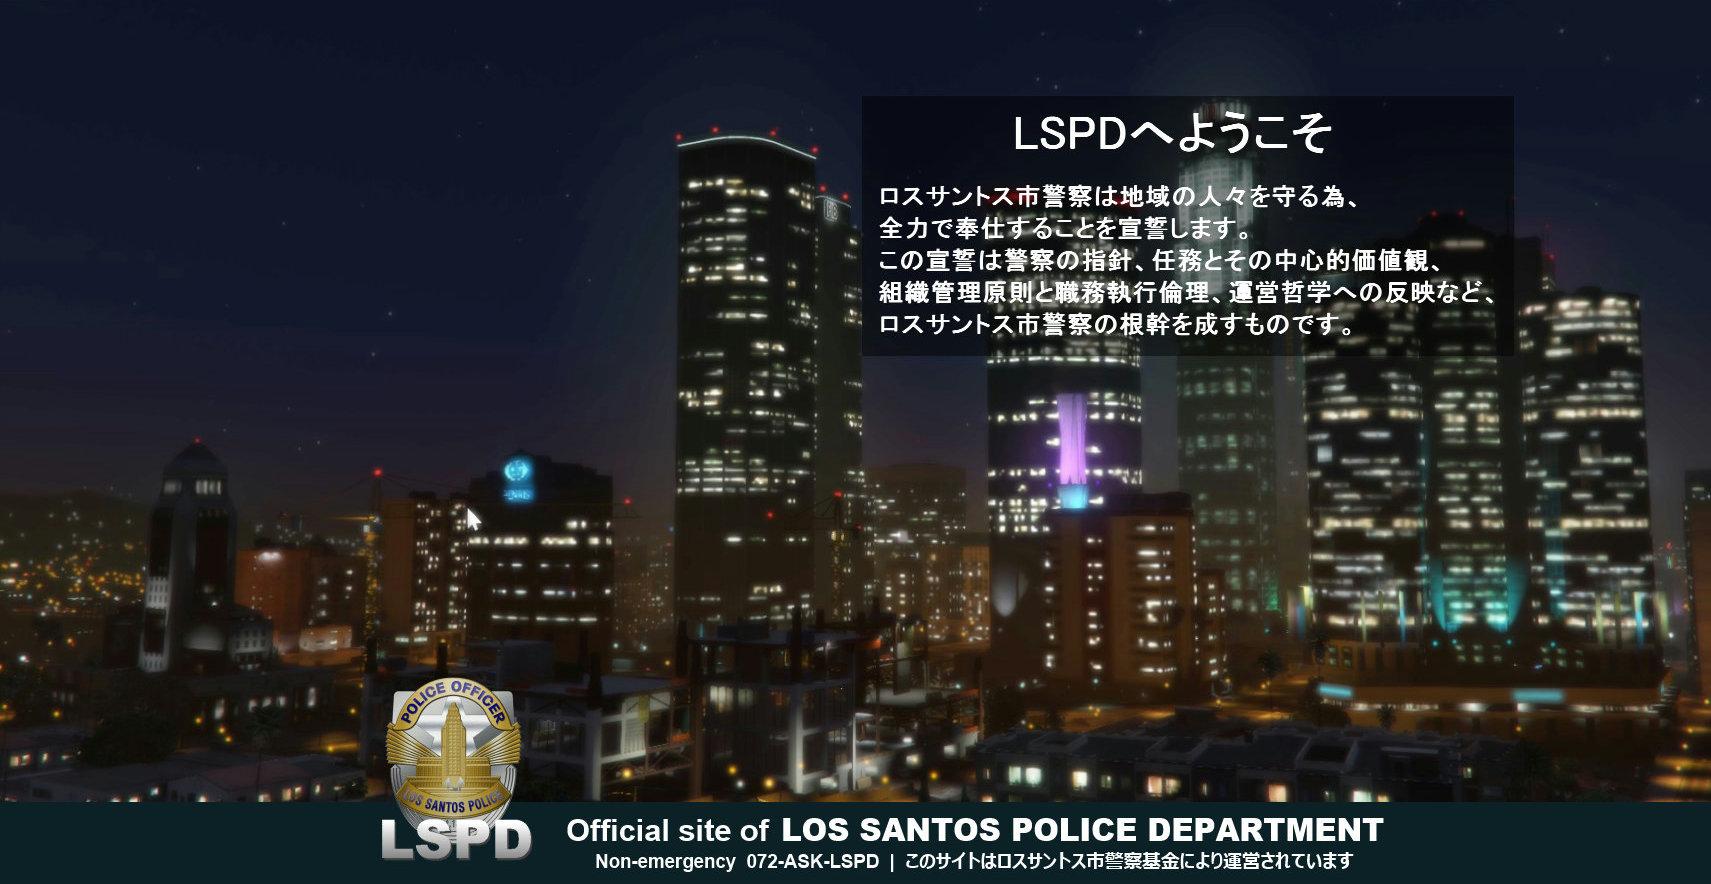 LSPD:First Response まとめサイト